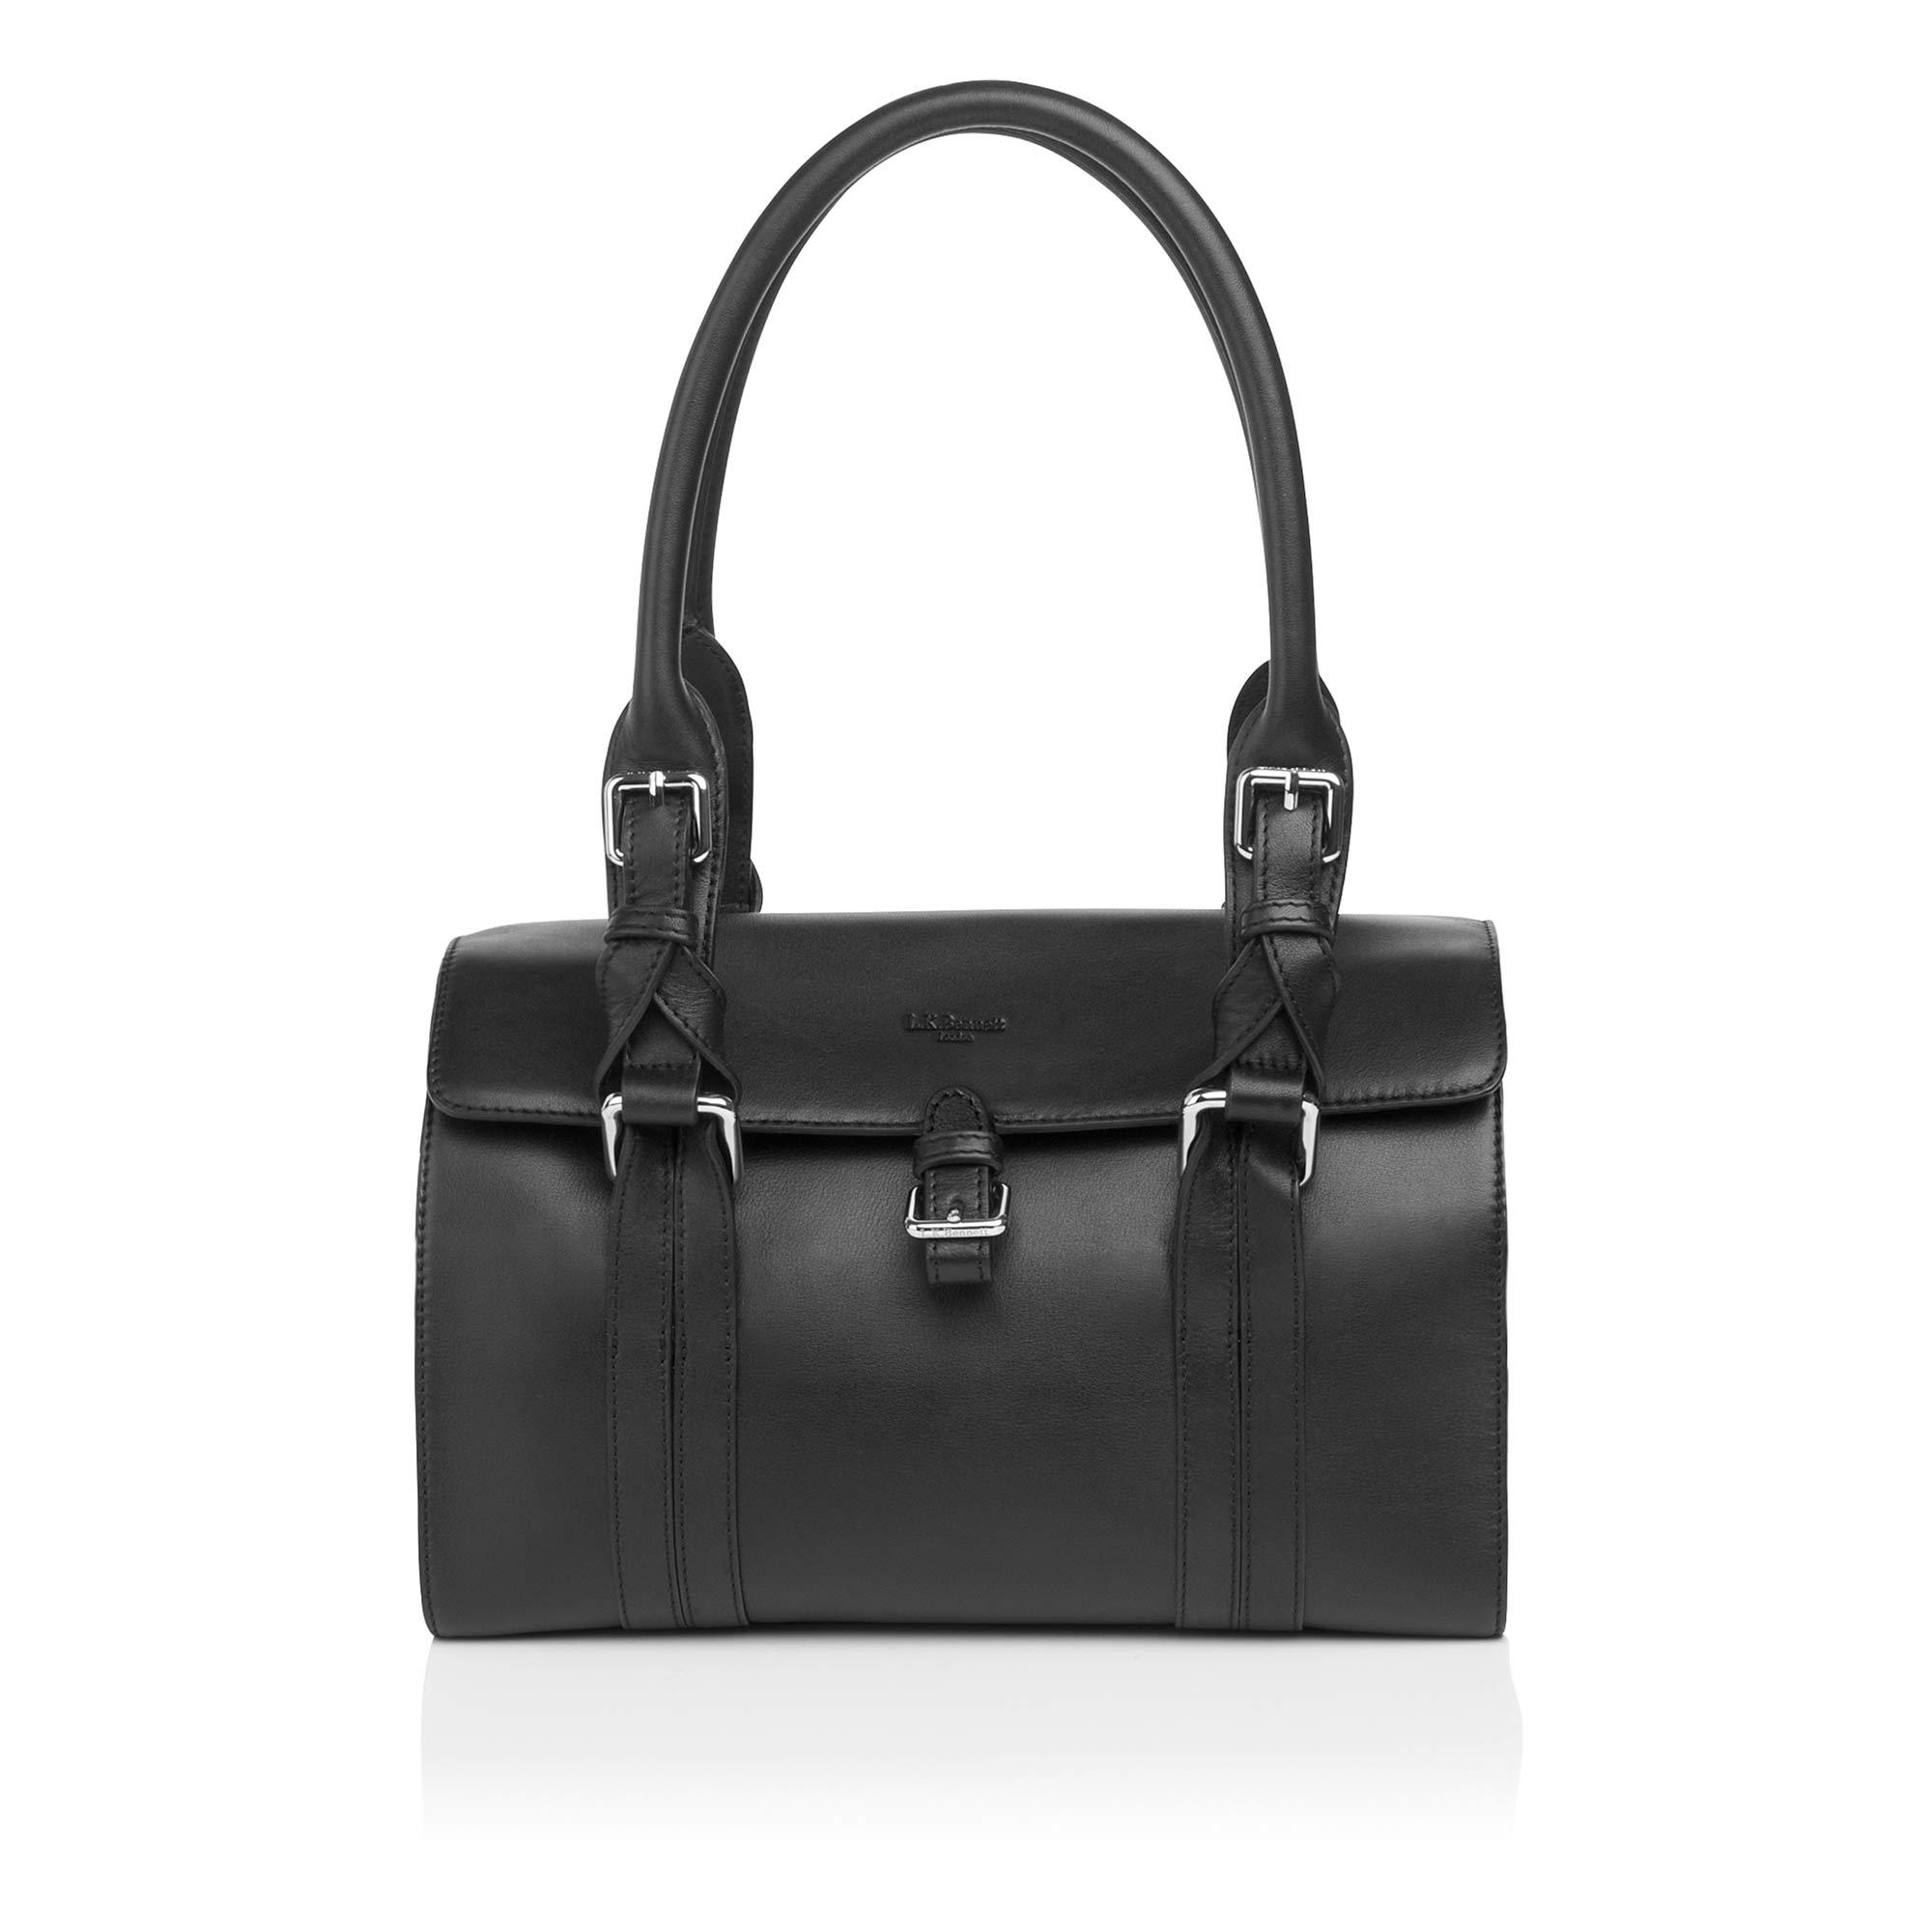 f23240b743e3 Emeline Leather Small Shoulder Bag